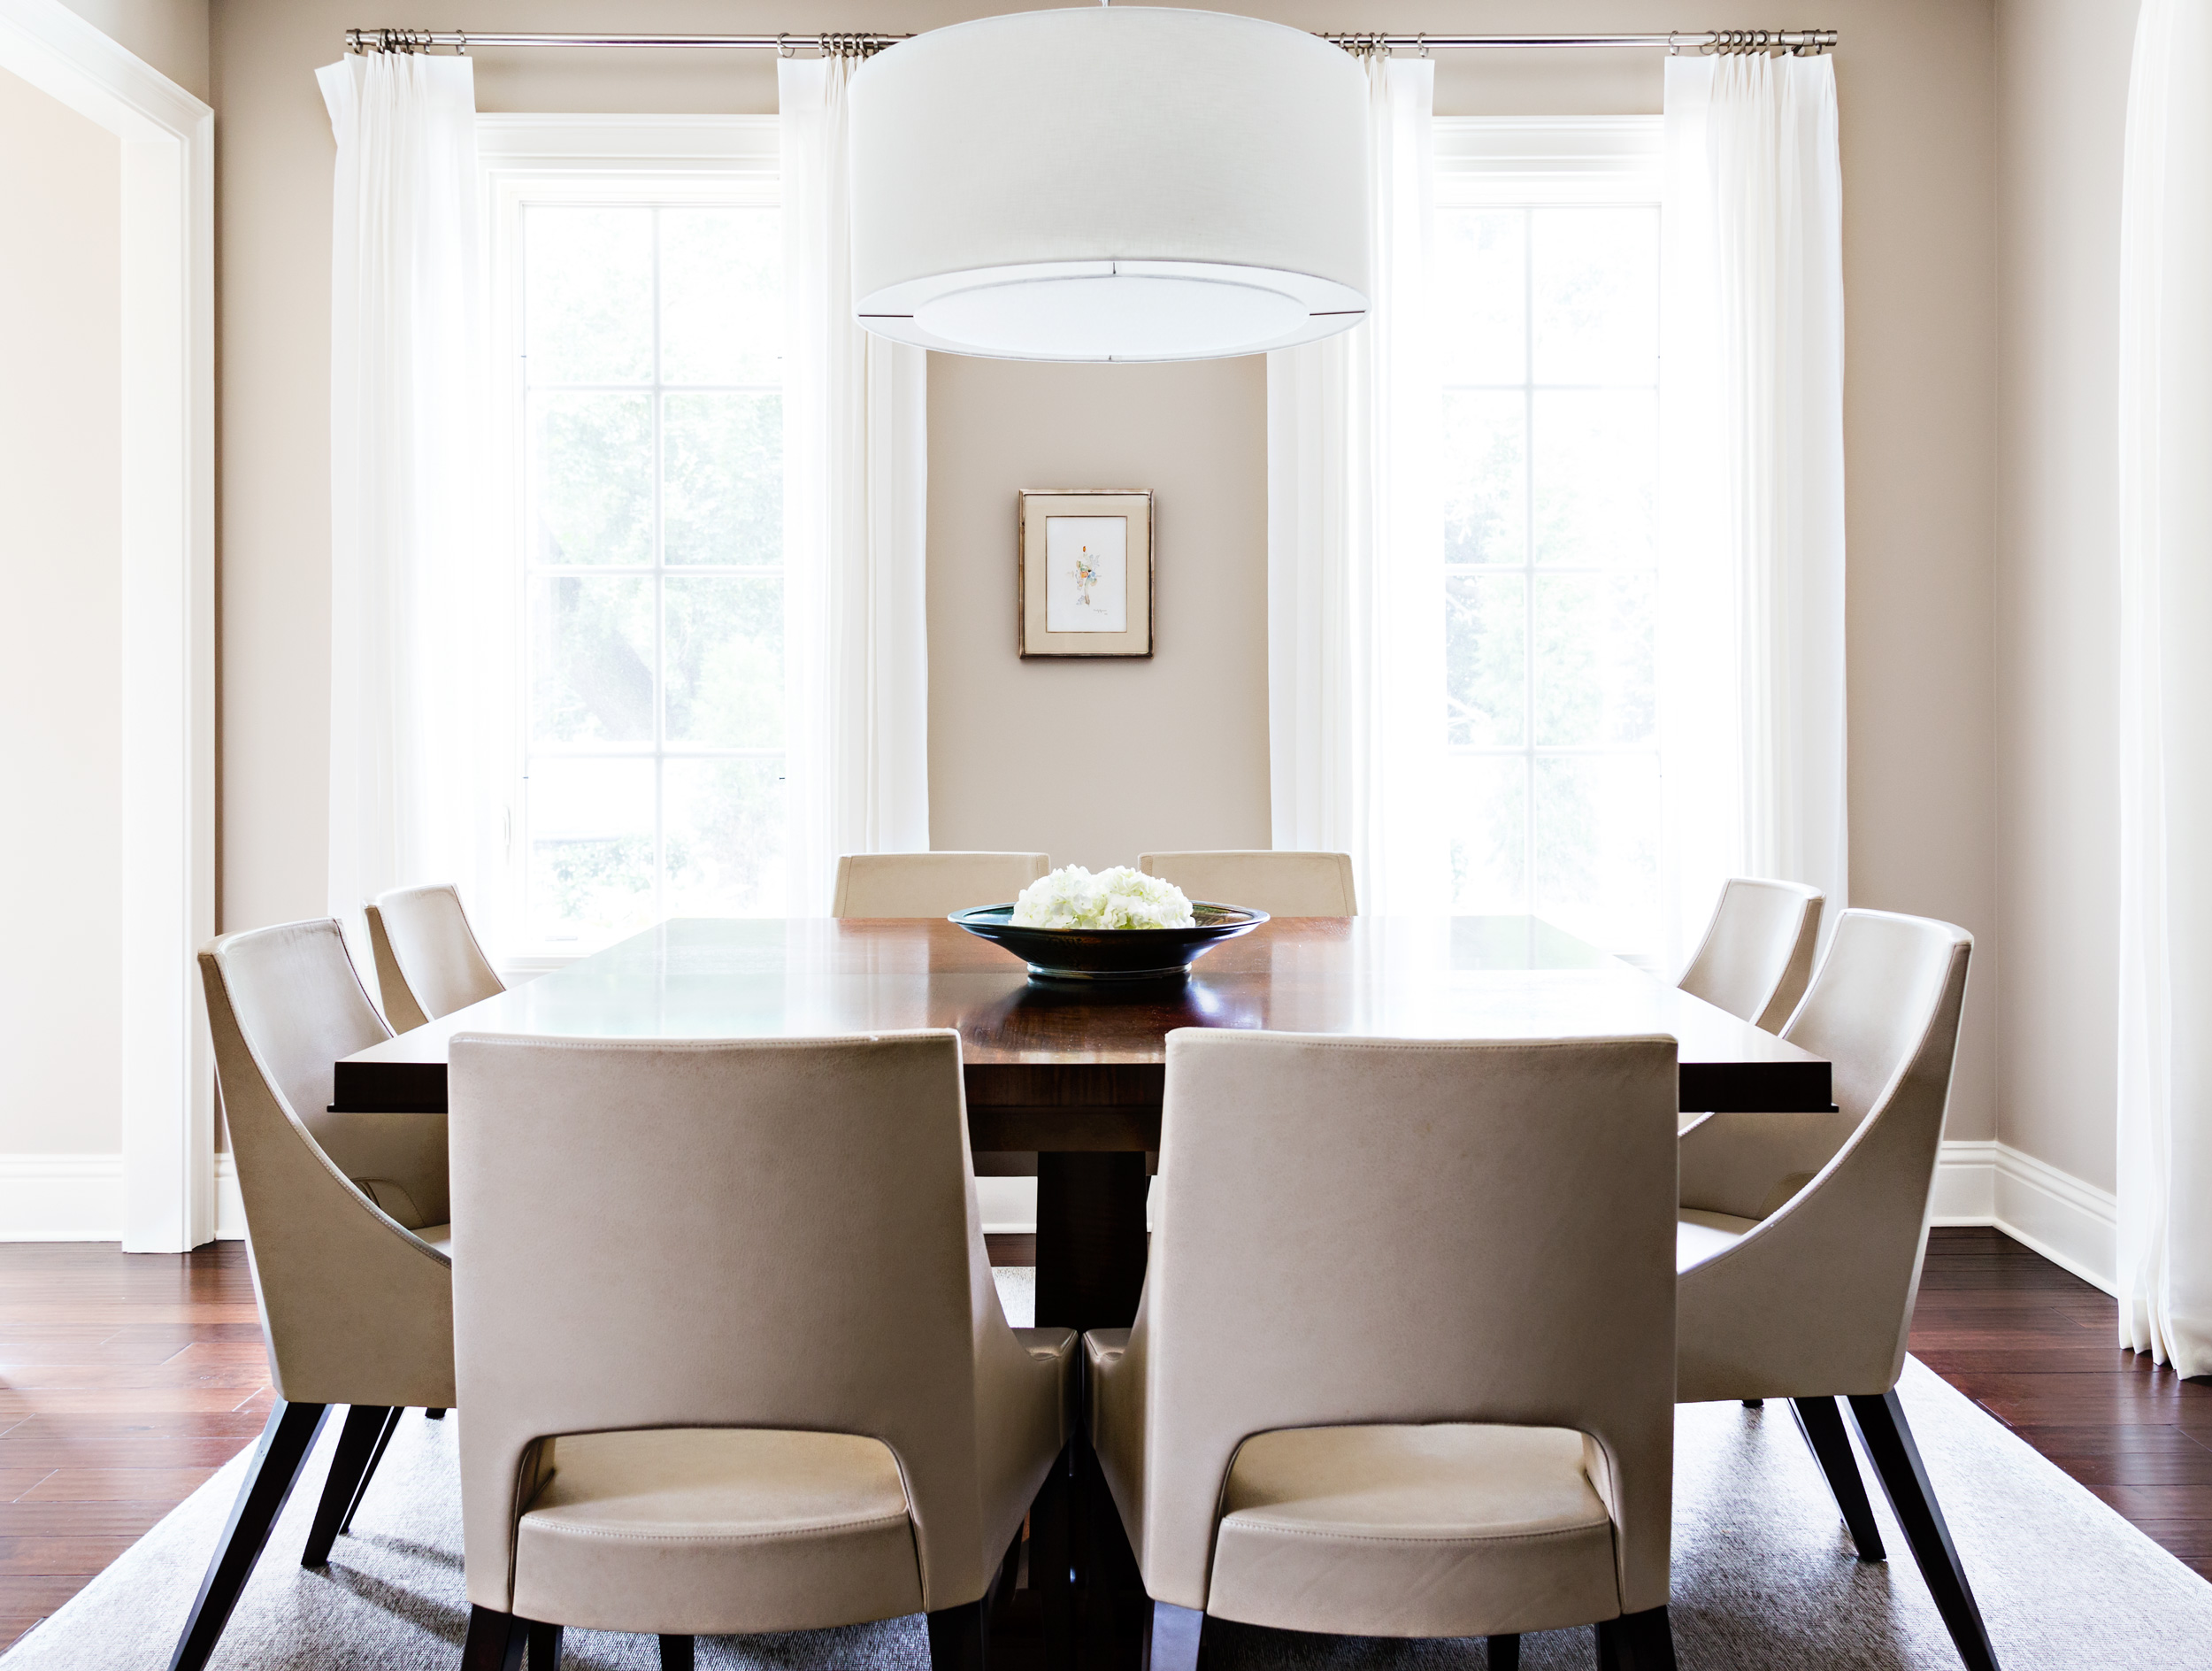 tampa interior design studio doxa design group